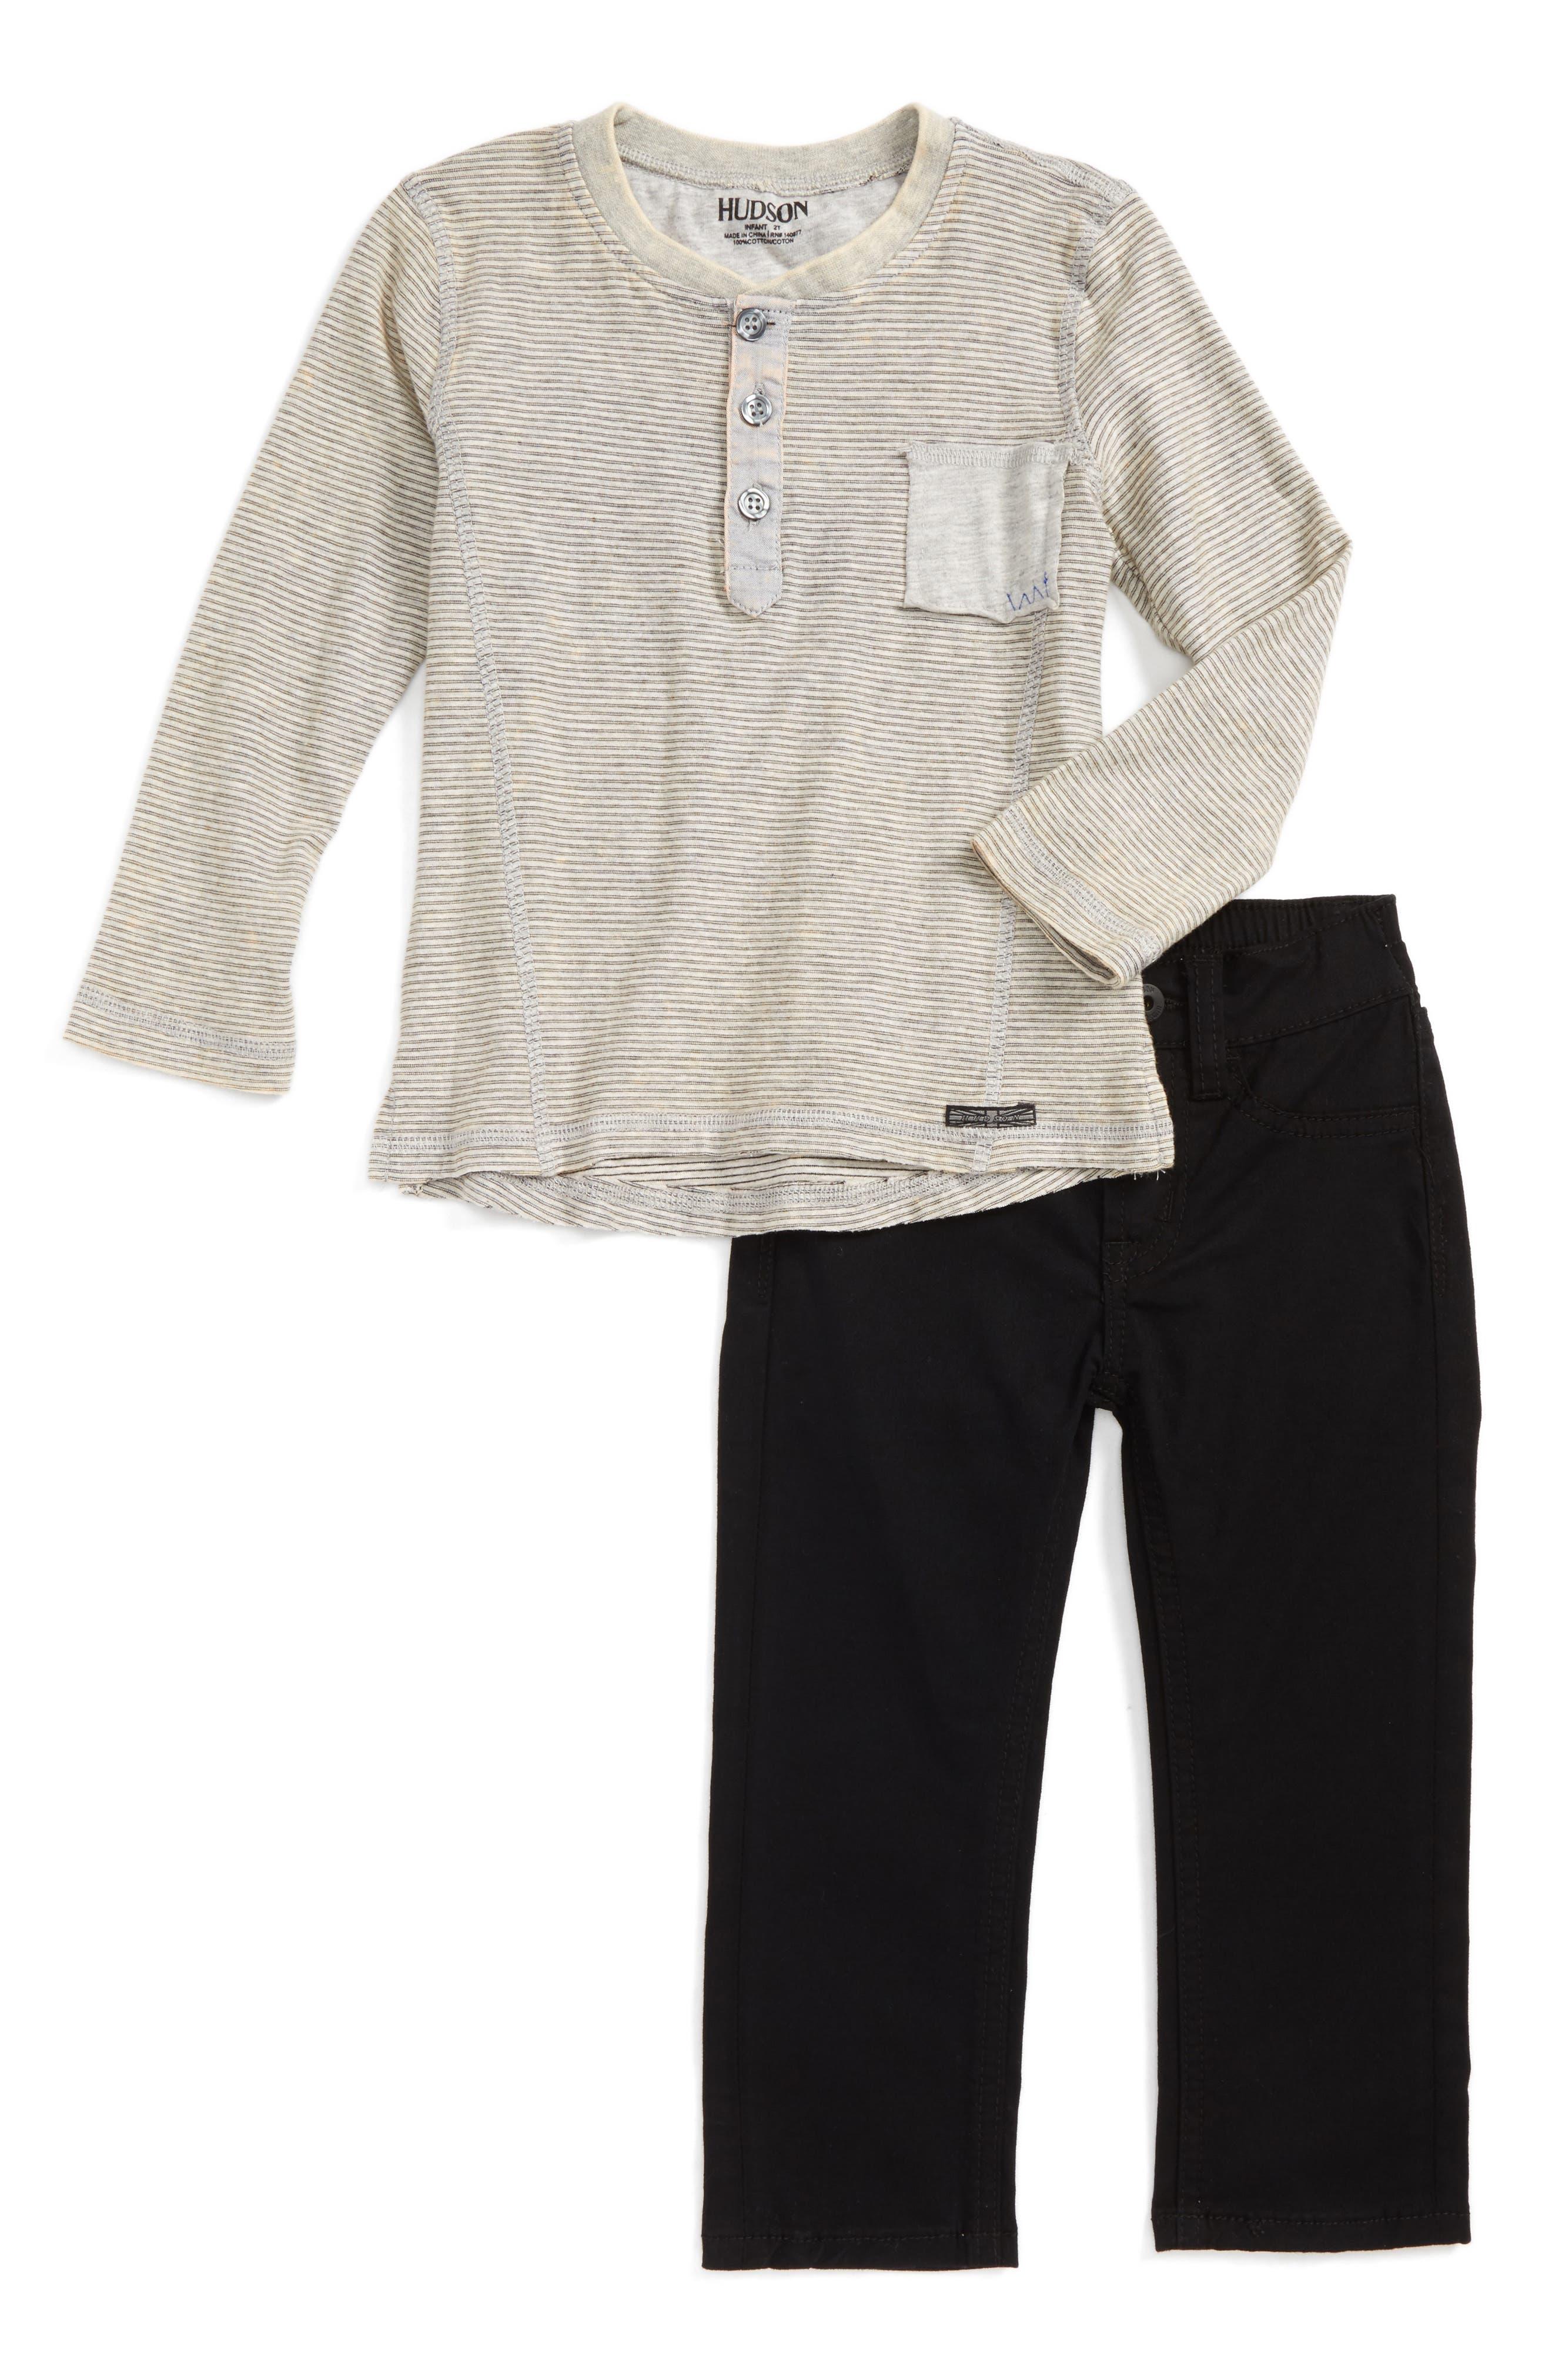 Alternate Image 1 Selected - Hudson Stripe Henley & Jeans Set (Toddler Boys)